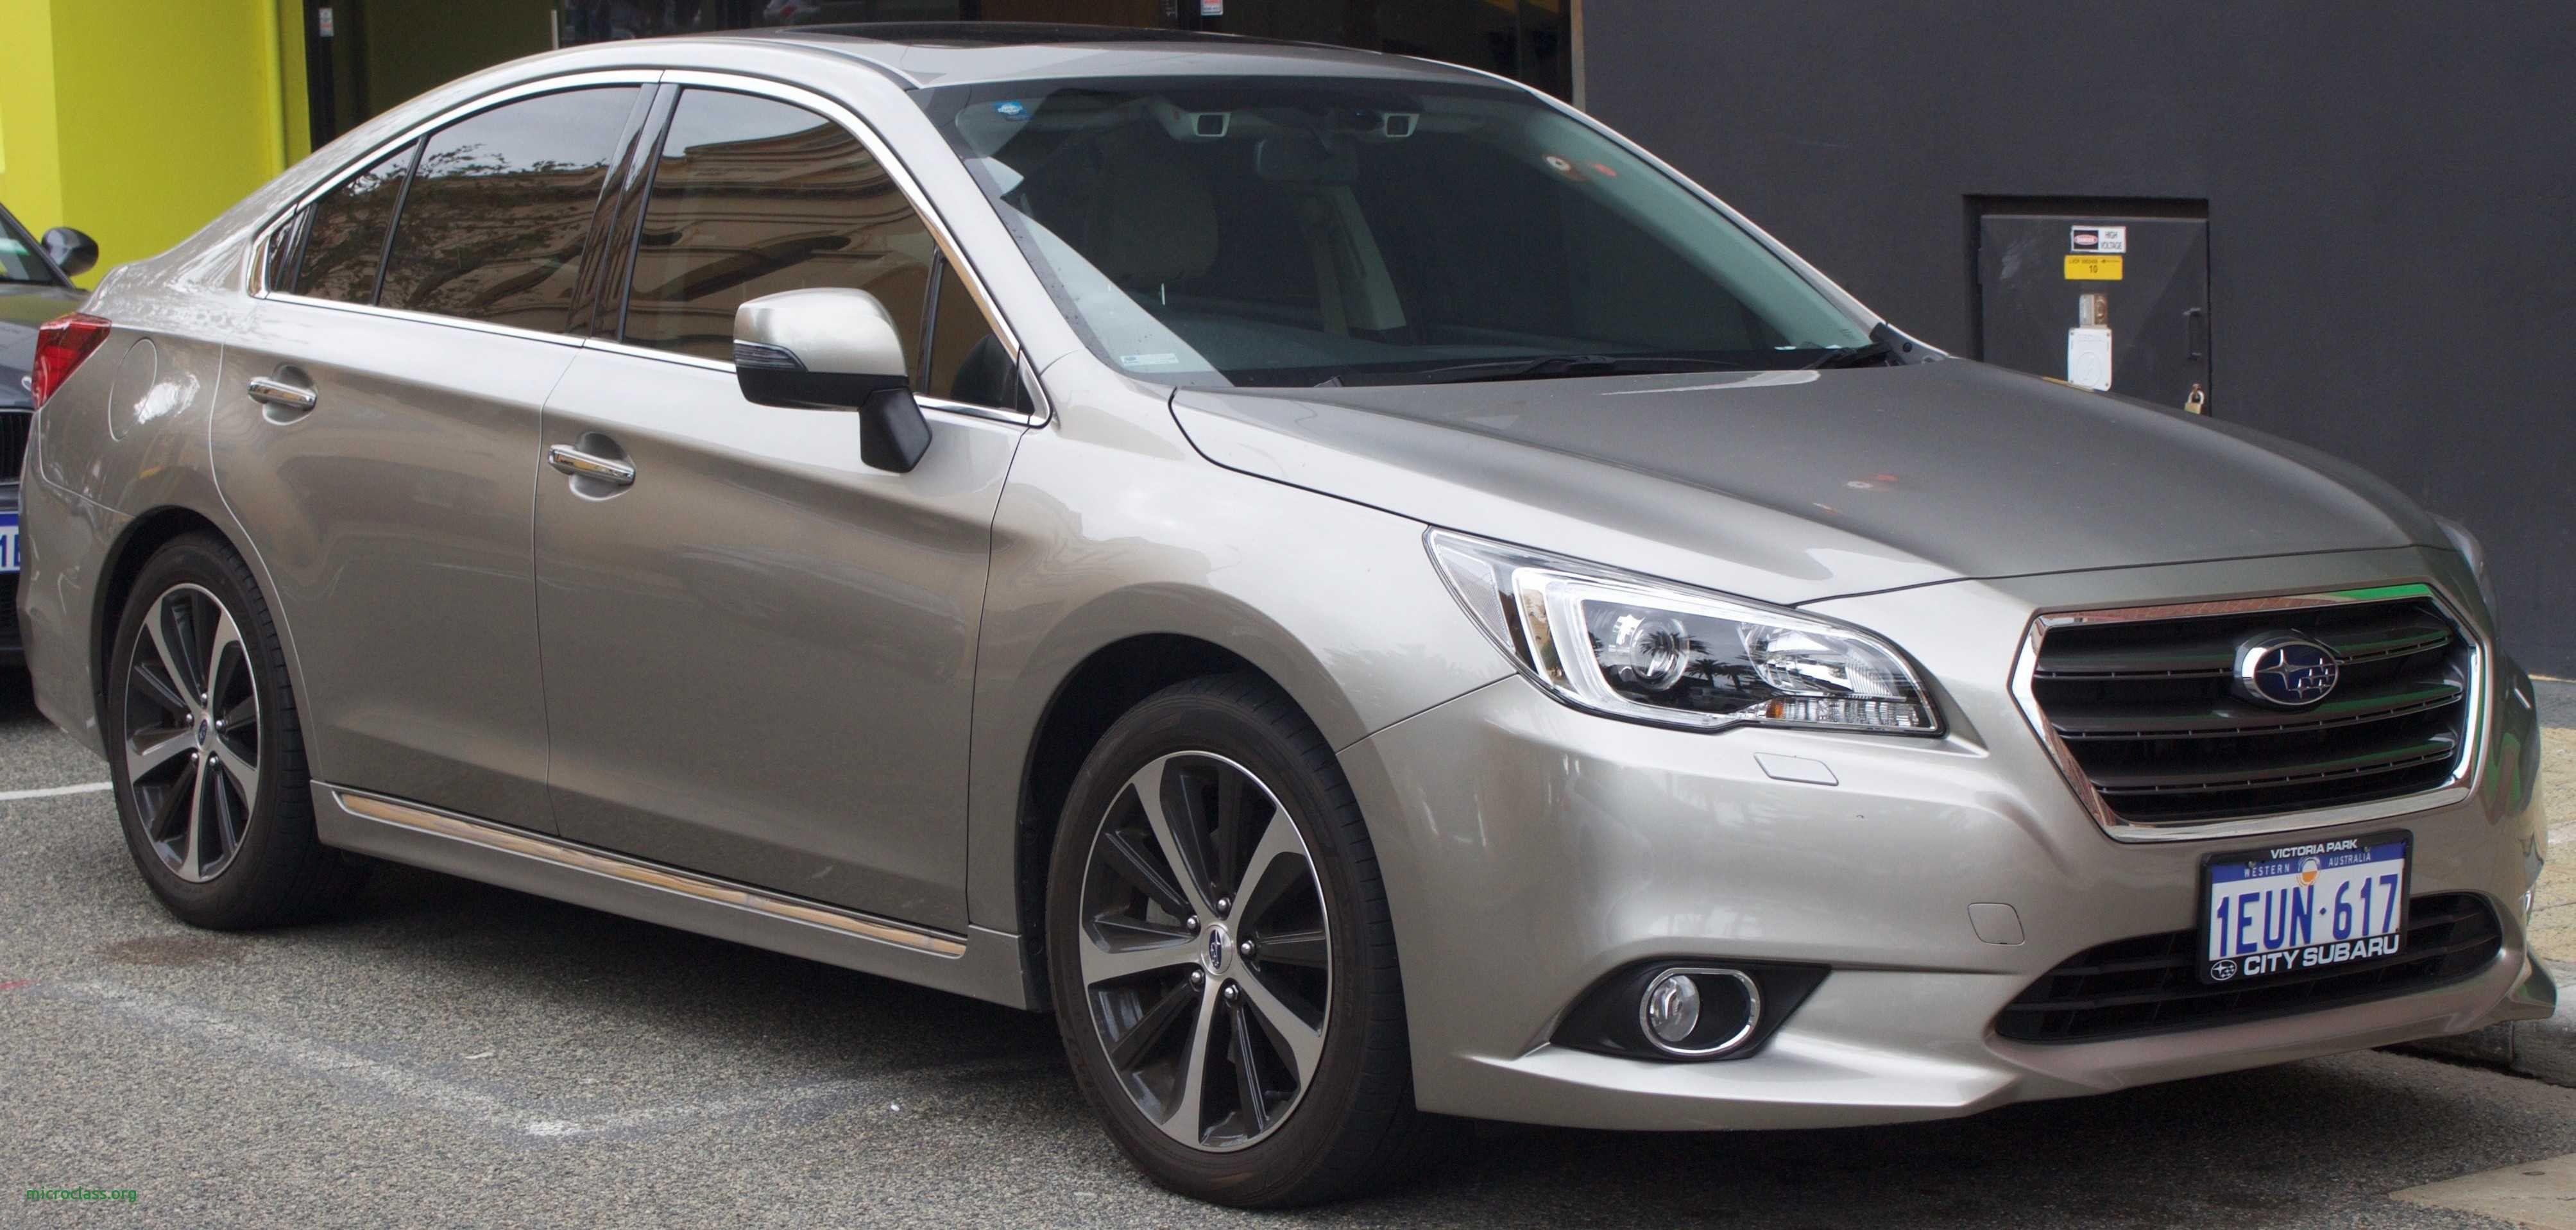 2020 Subaru Legacy Luxury 2019 Subaru Legacy Turbo Gt Subaru Outback